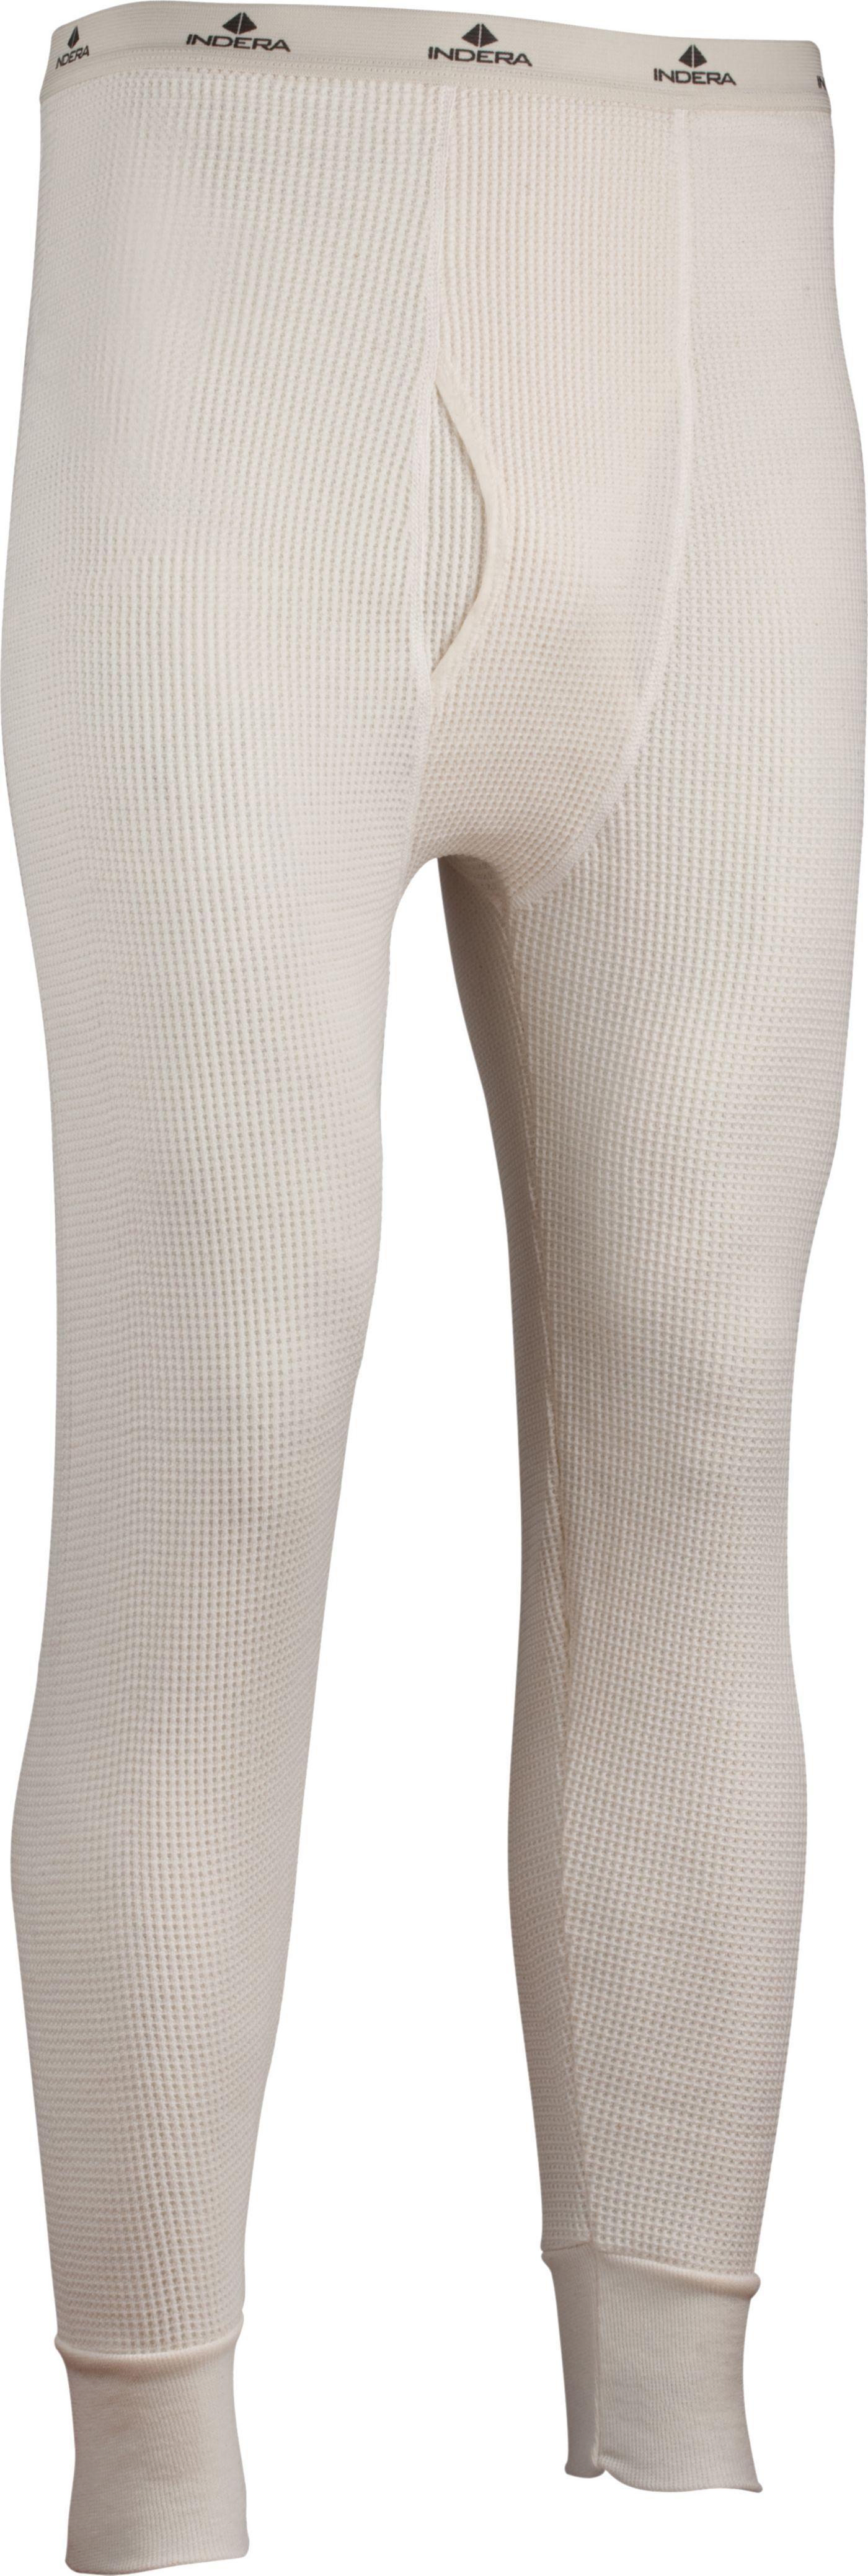 Indera Men's Maximum Weight Thermal Ankle Length Pants